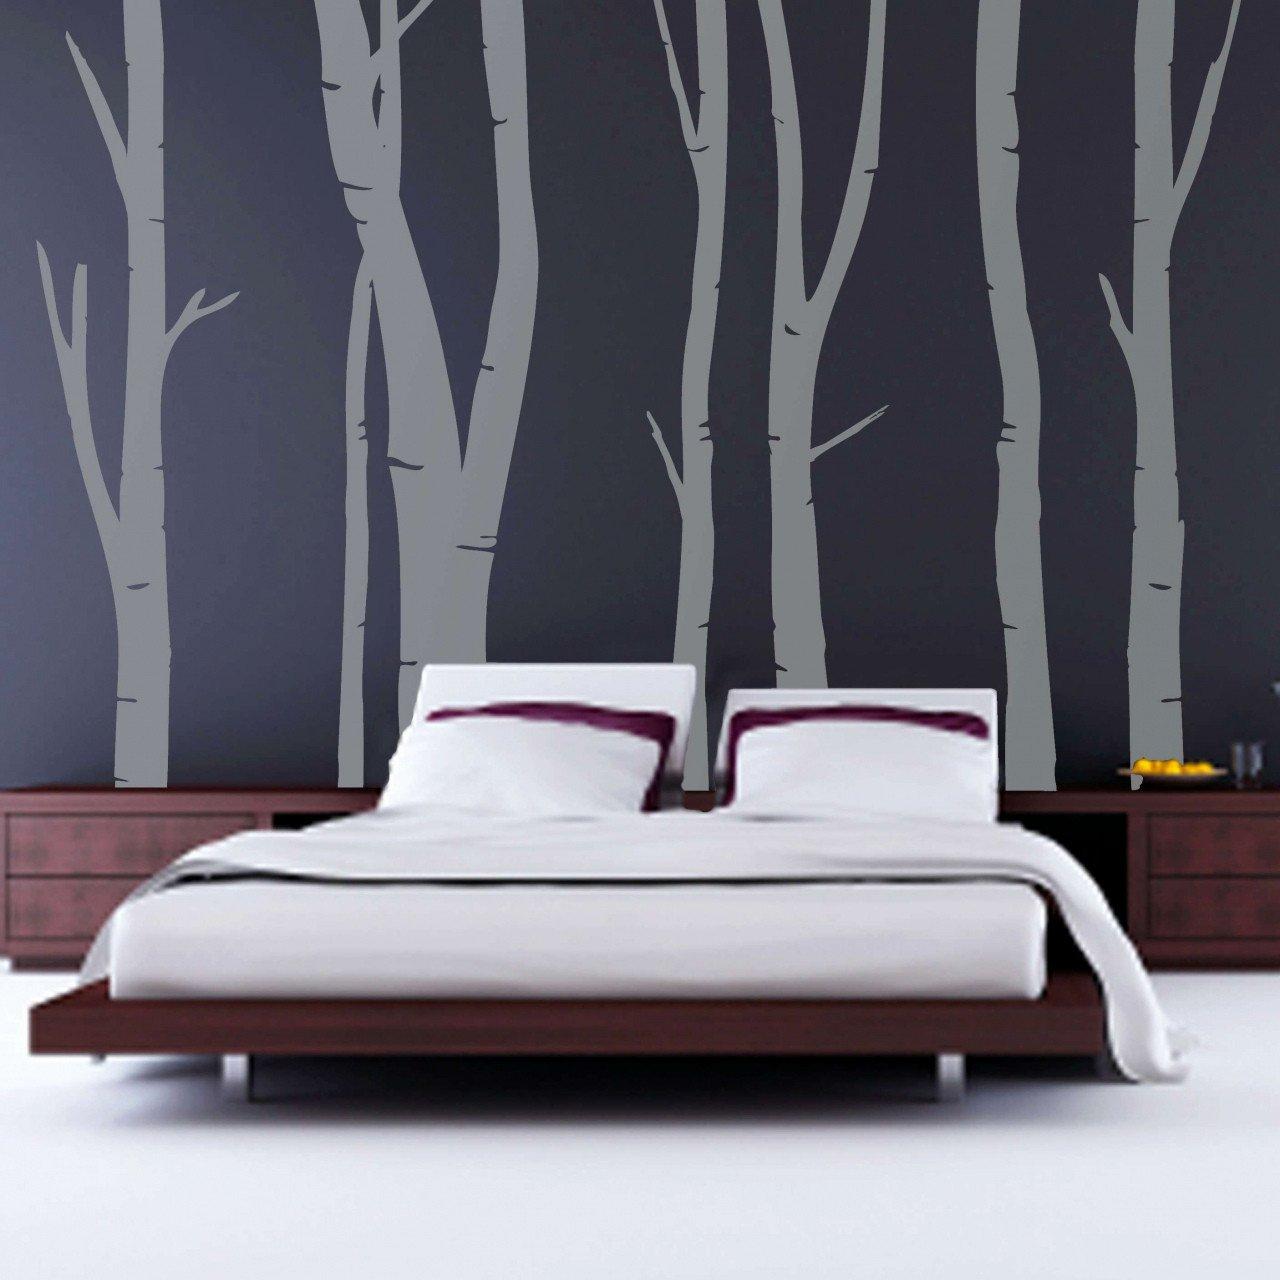 Bedroom before and after Best Of Bedroom Art Wall Decals for Bedroom Unique 1 Kirkland Wall